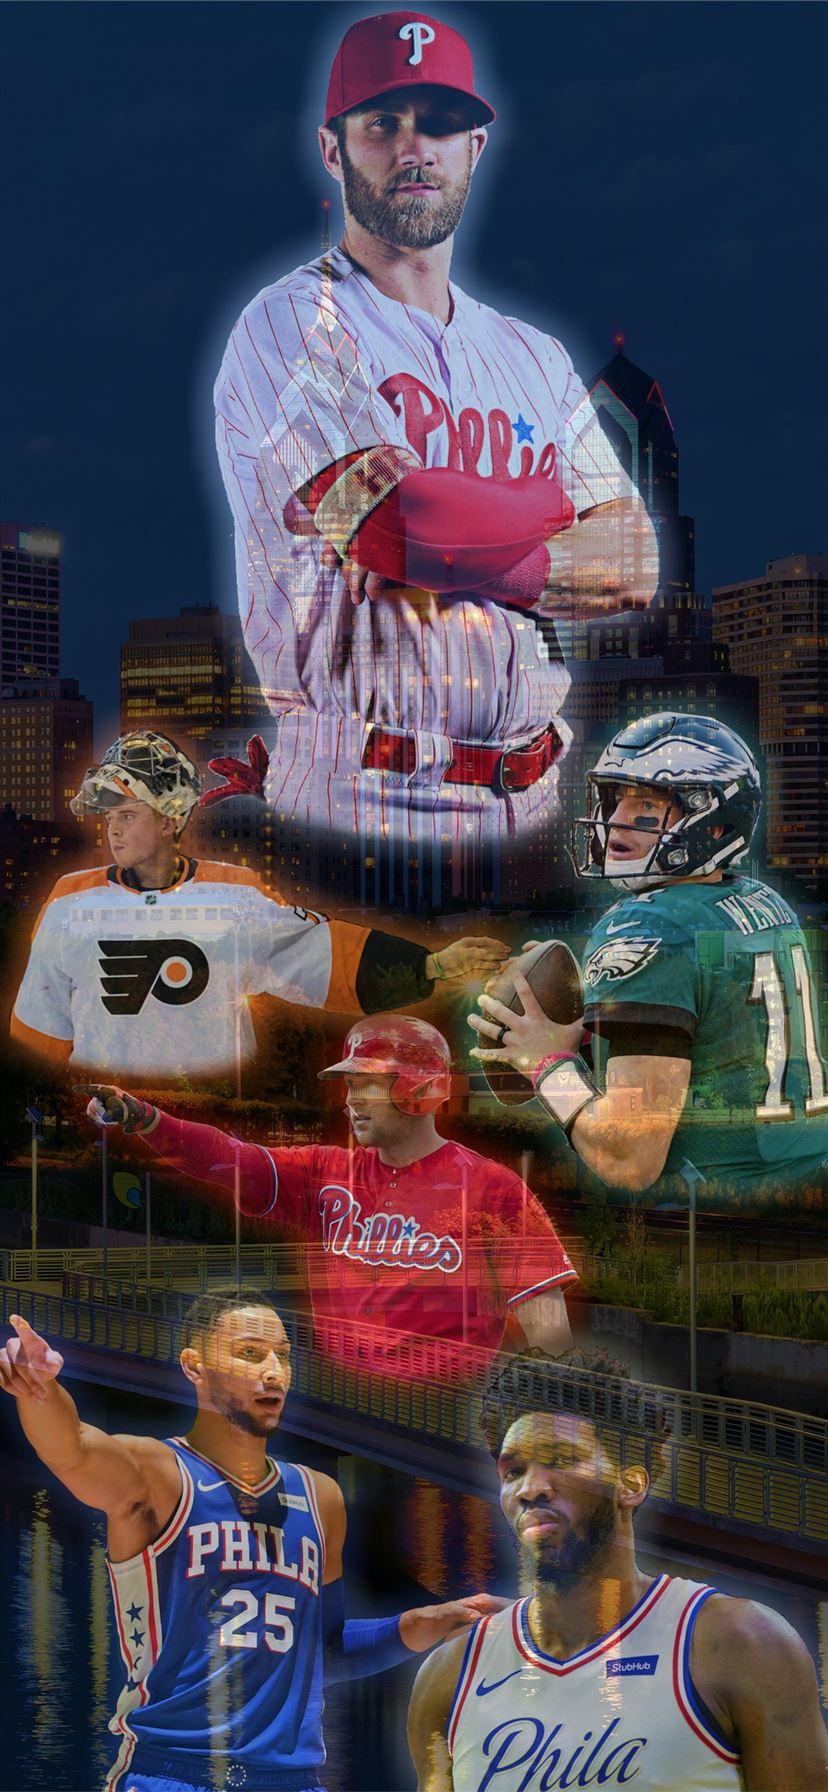 Best Baseball Celebrity Iphone 11 Wallpapers Hd Ilikewallpaper